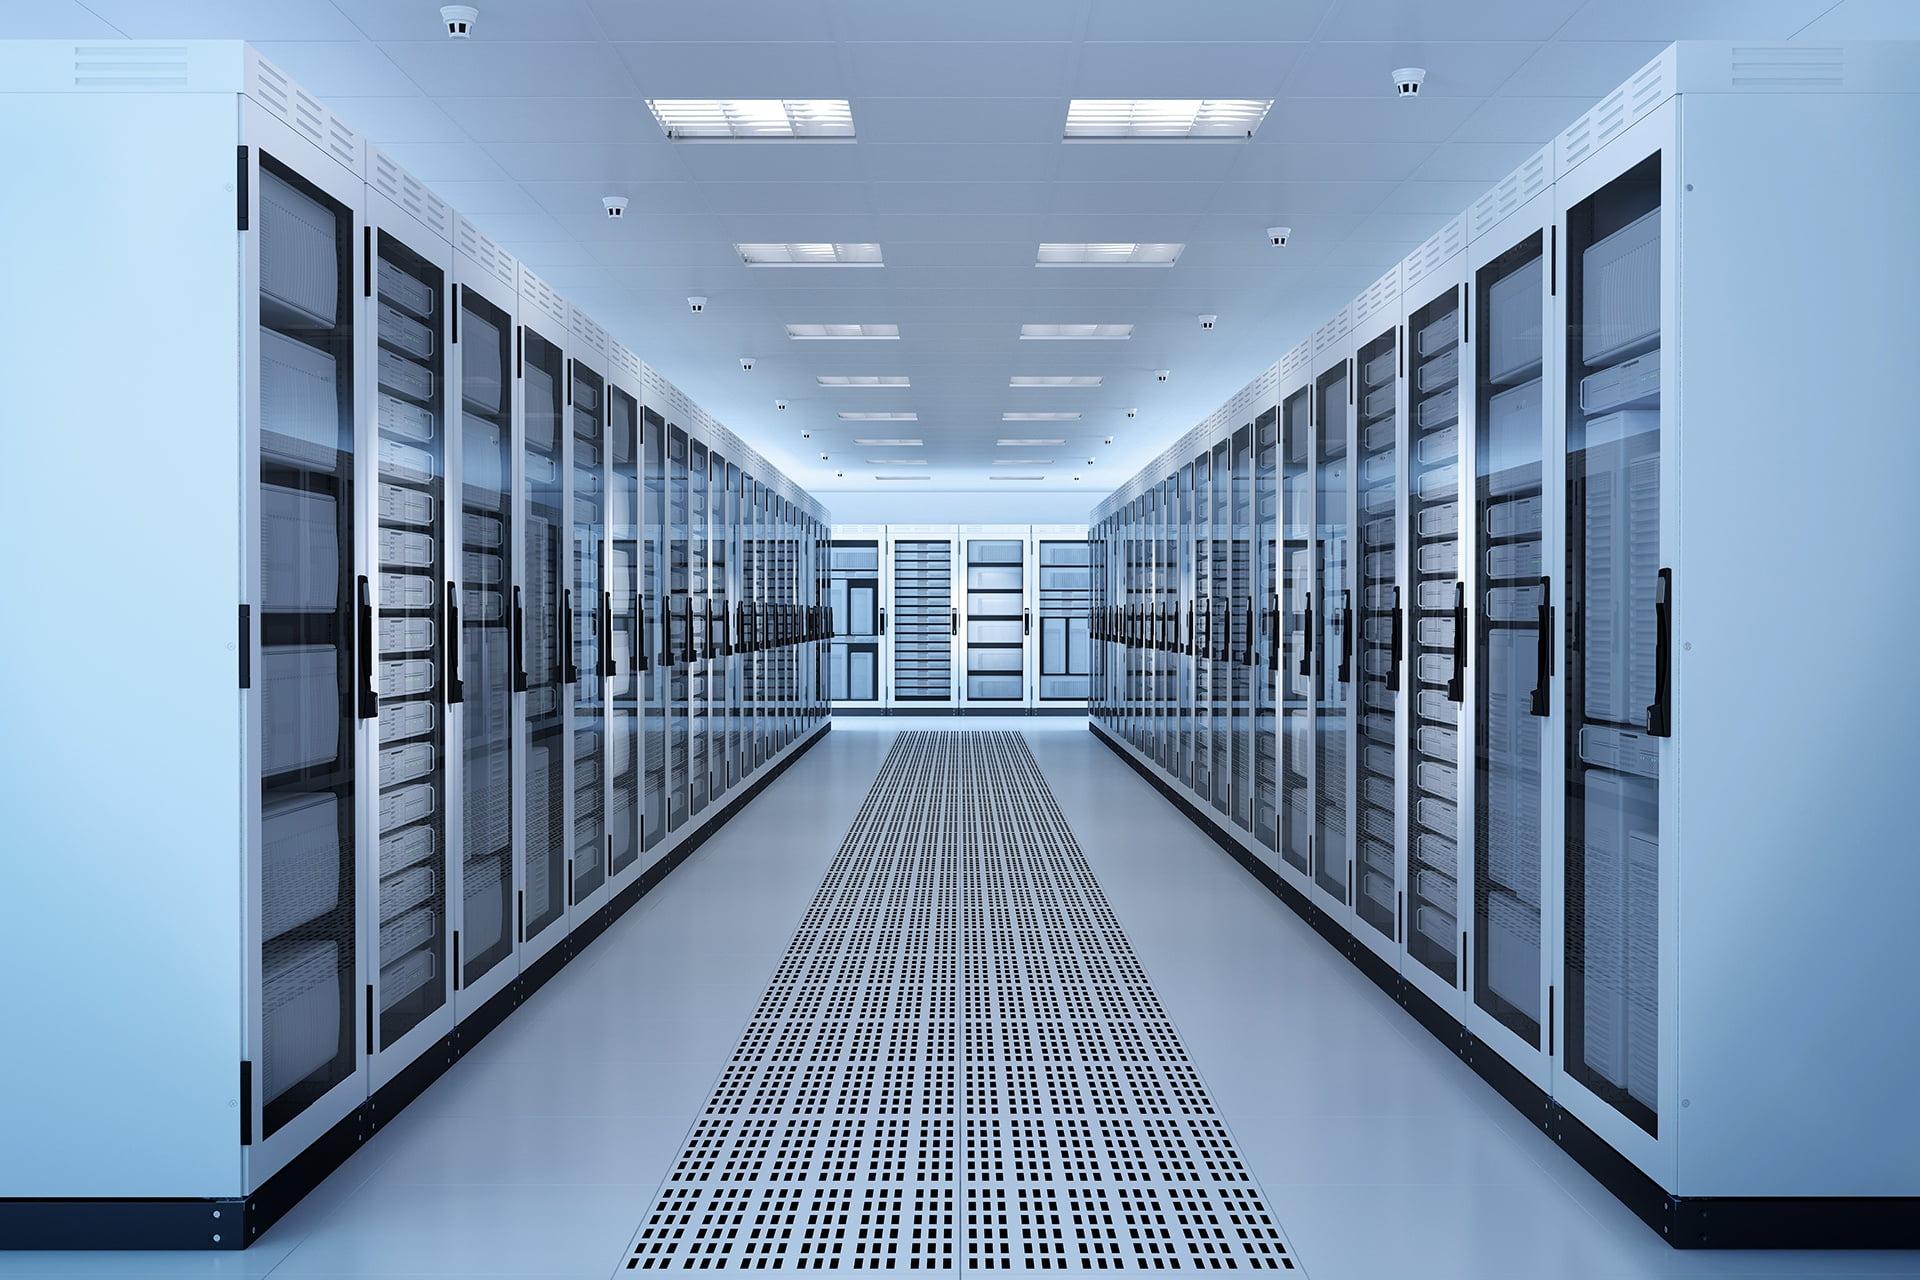 IXAfrica data center